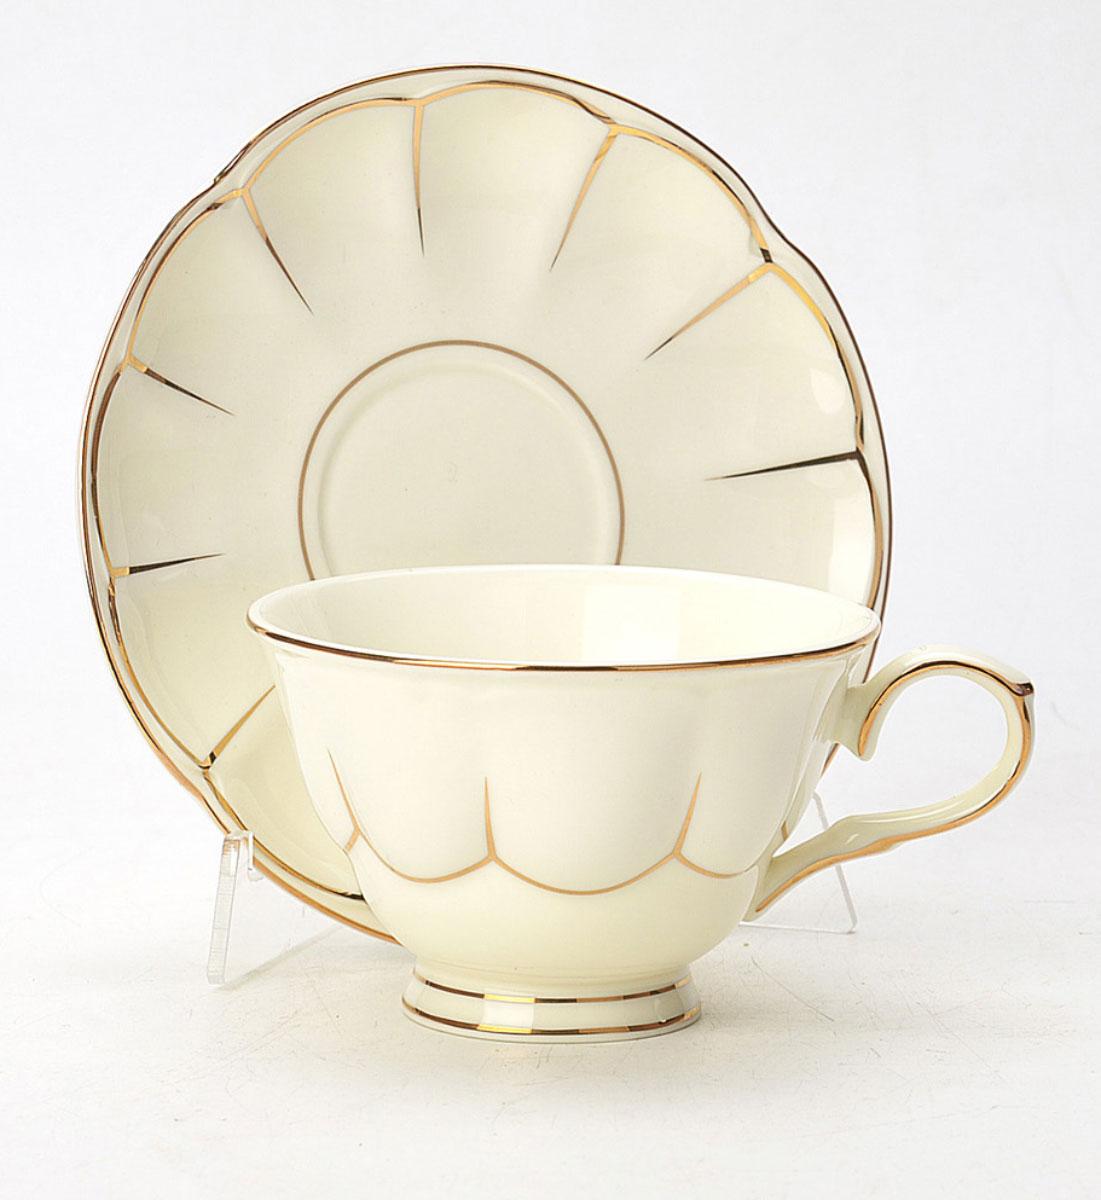 Чайная пара Mayer & Boch, 200 мл, 2 предмета. 2190721907